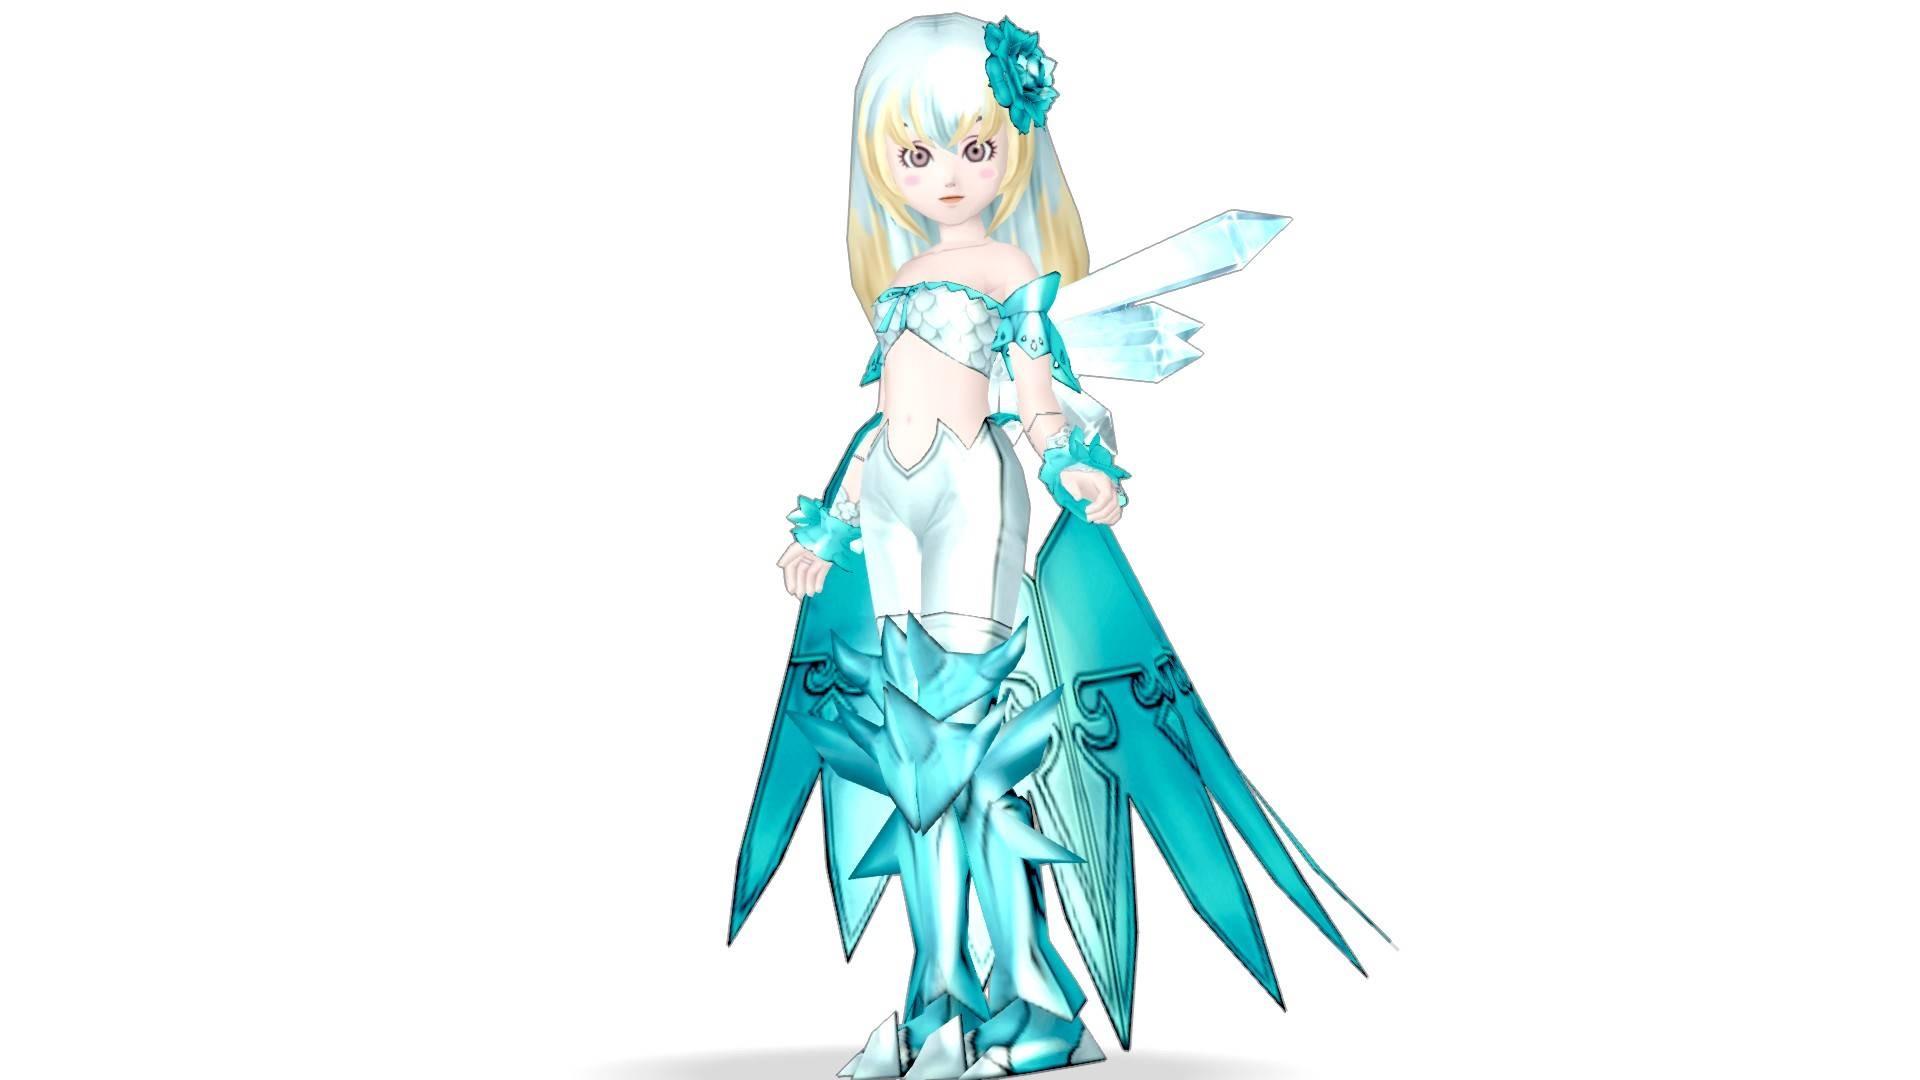 f:id:LunaMerrick:20201230003520j:plain